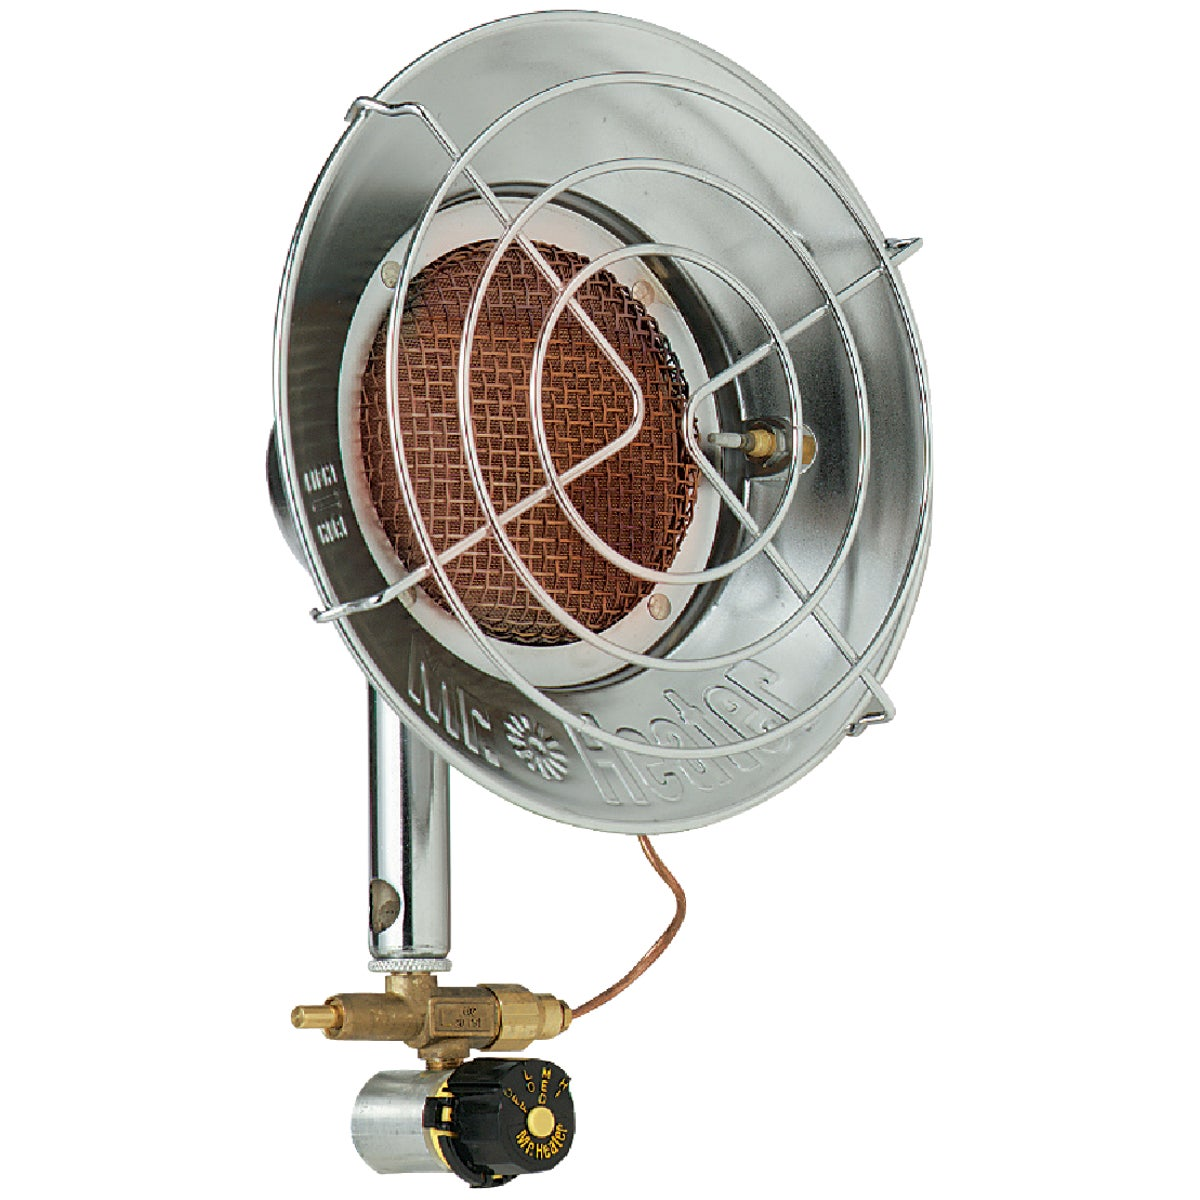 Mr. Heater LP GAS RADIANT HEATER F273100